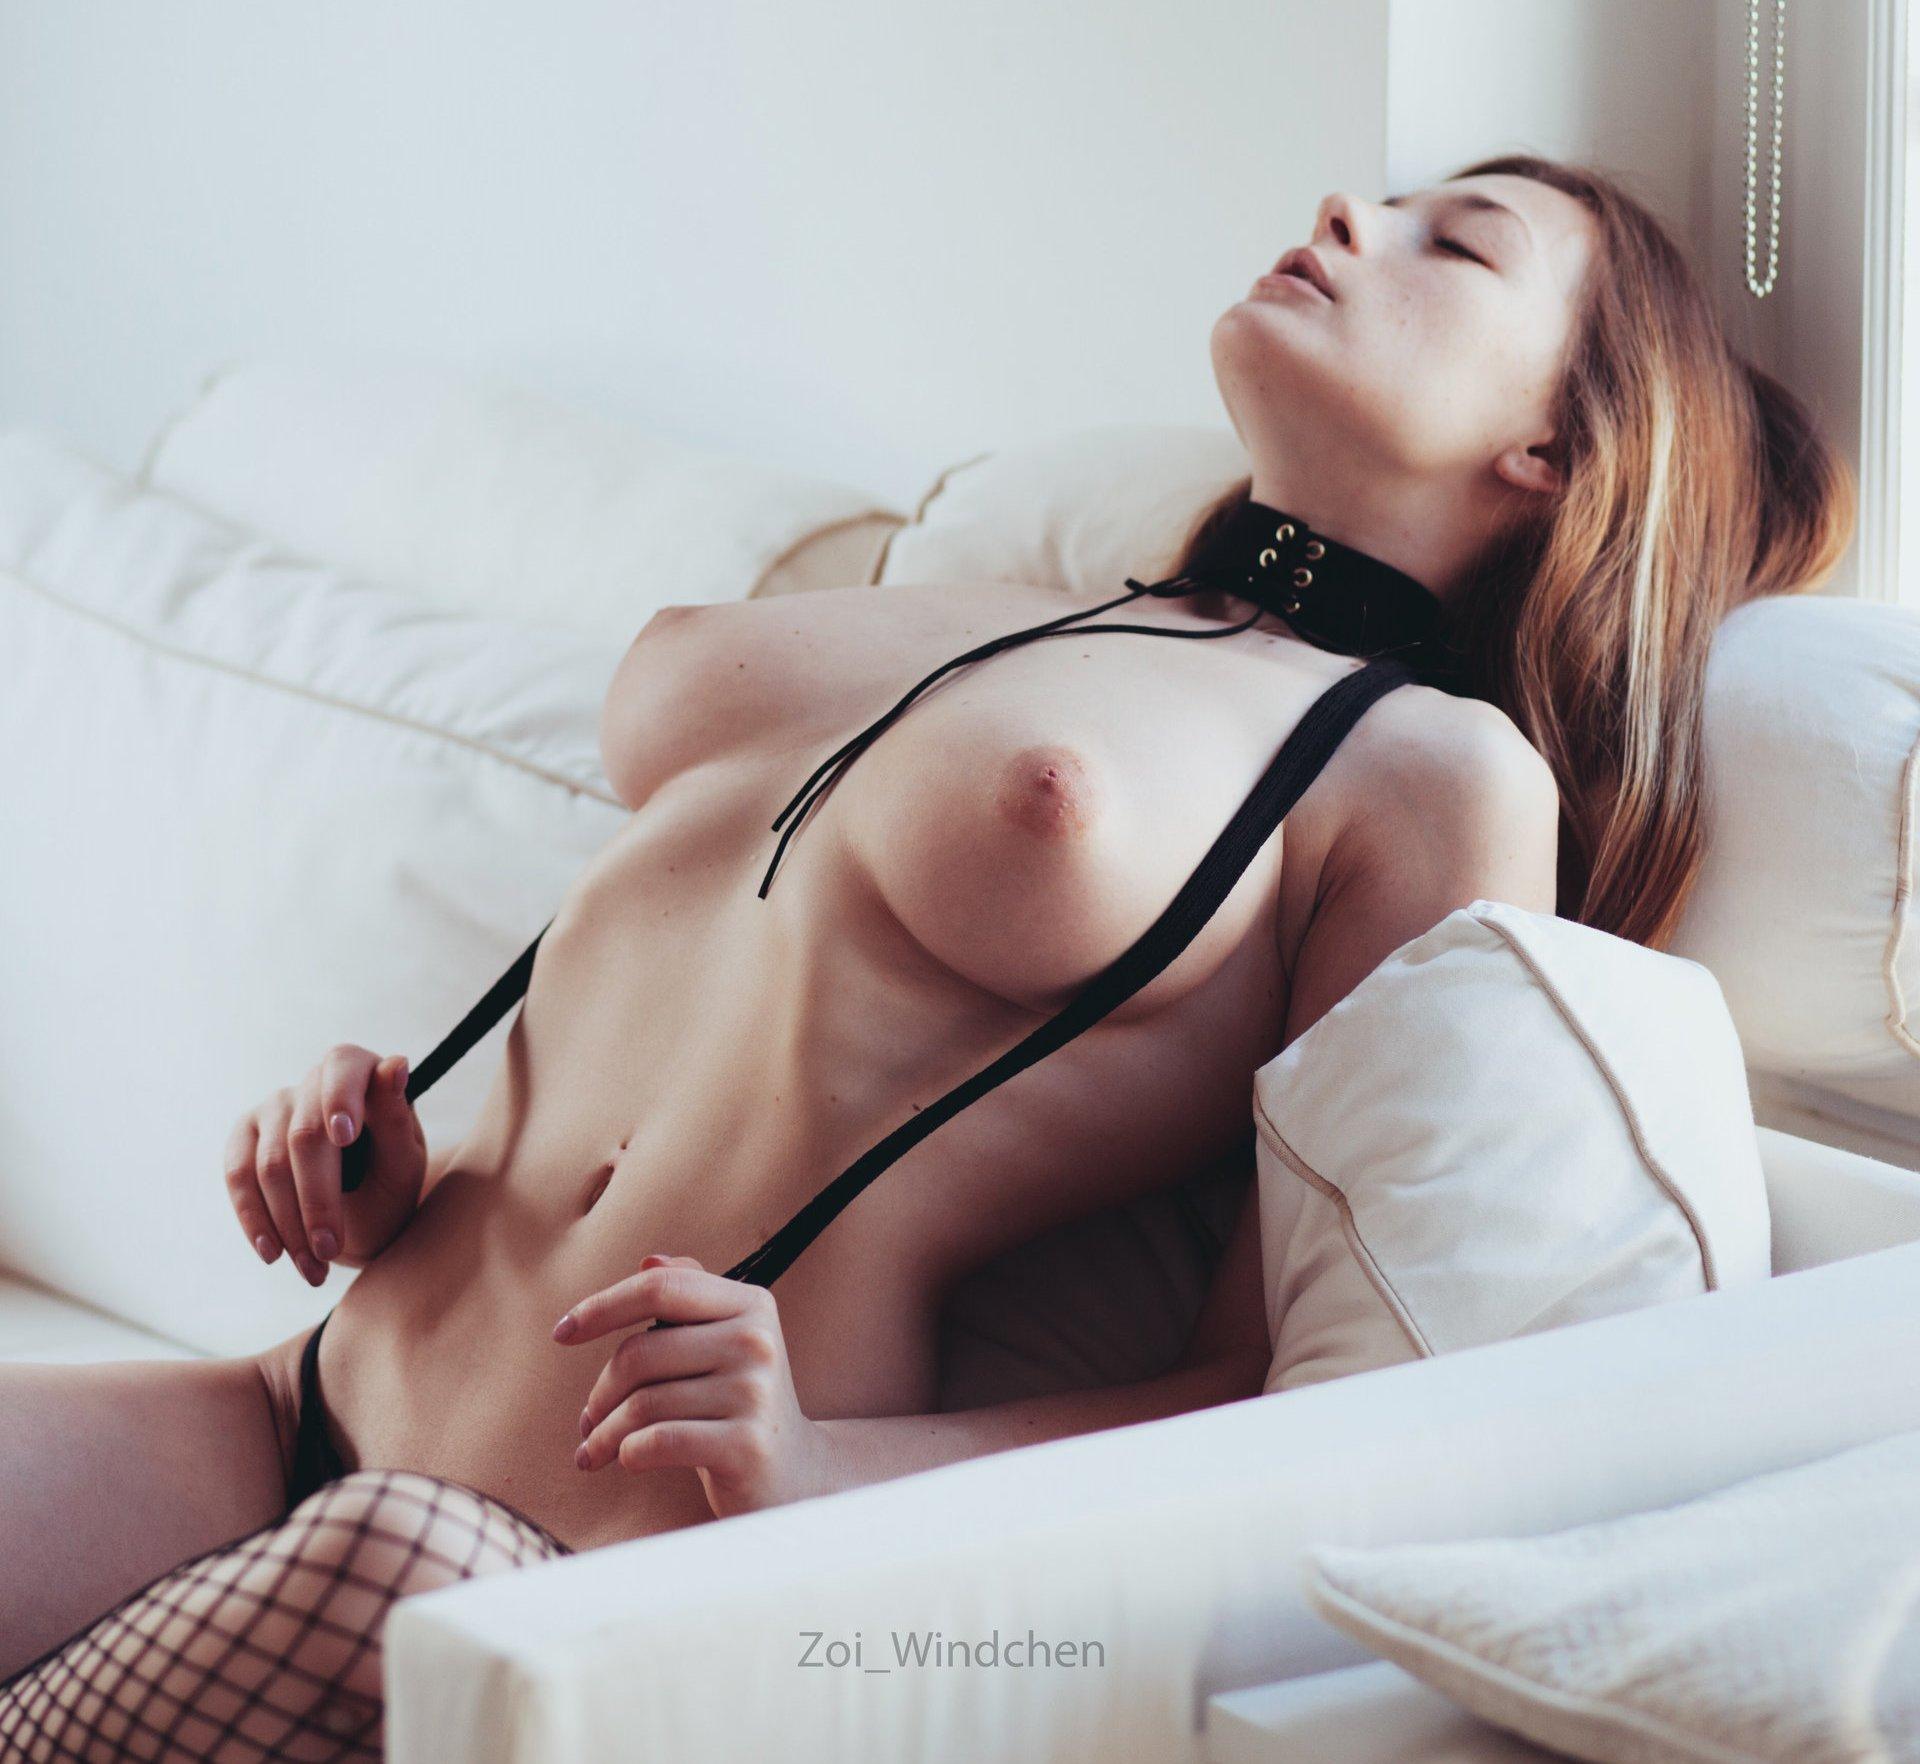 Olga Kobzar Bugs Bunny Gf Nudes Leaks 0084